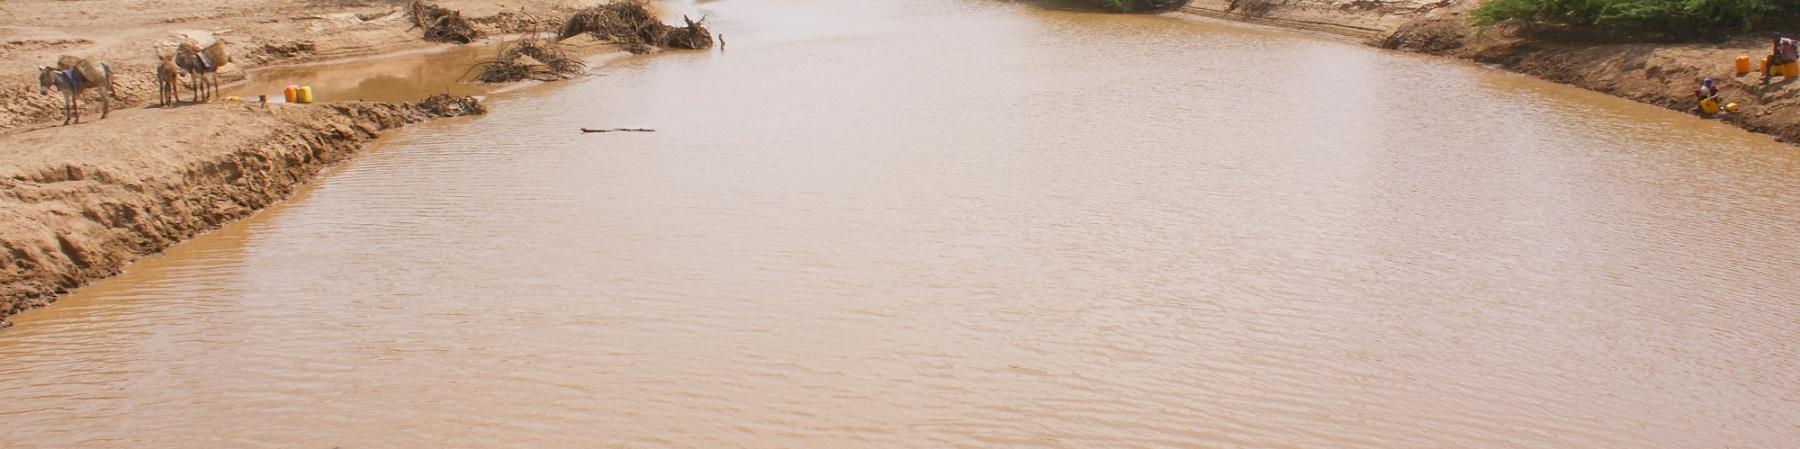 somalia flood alluvione